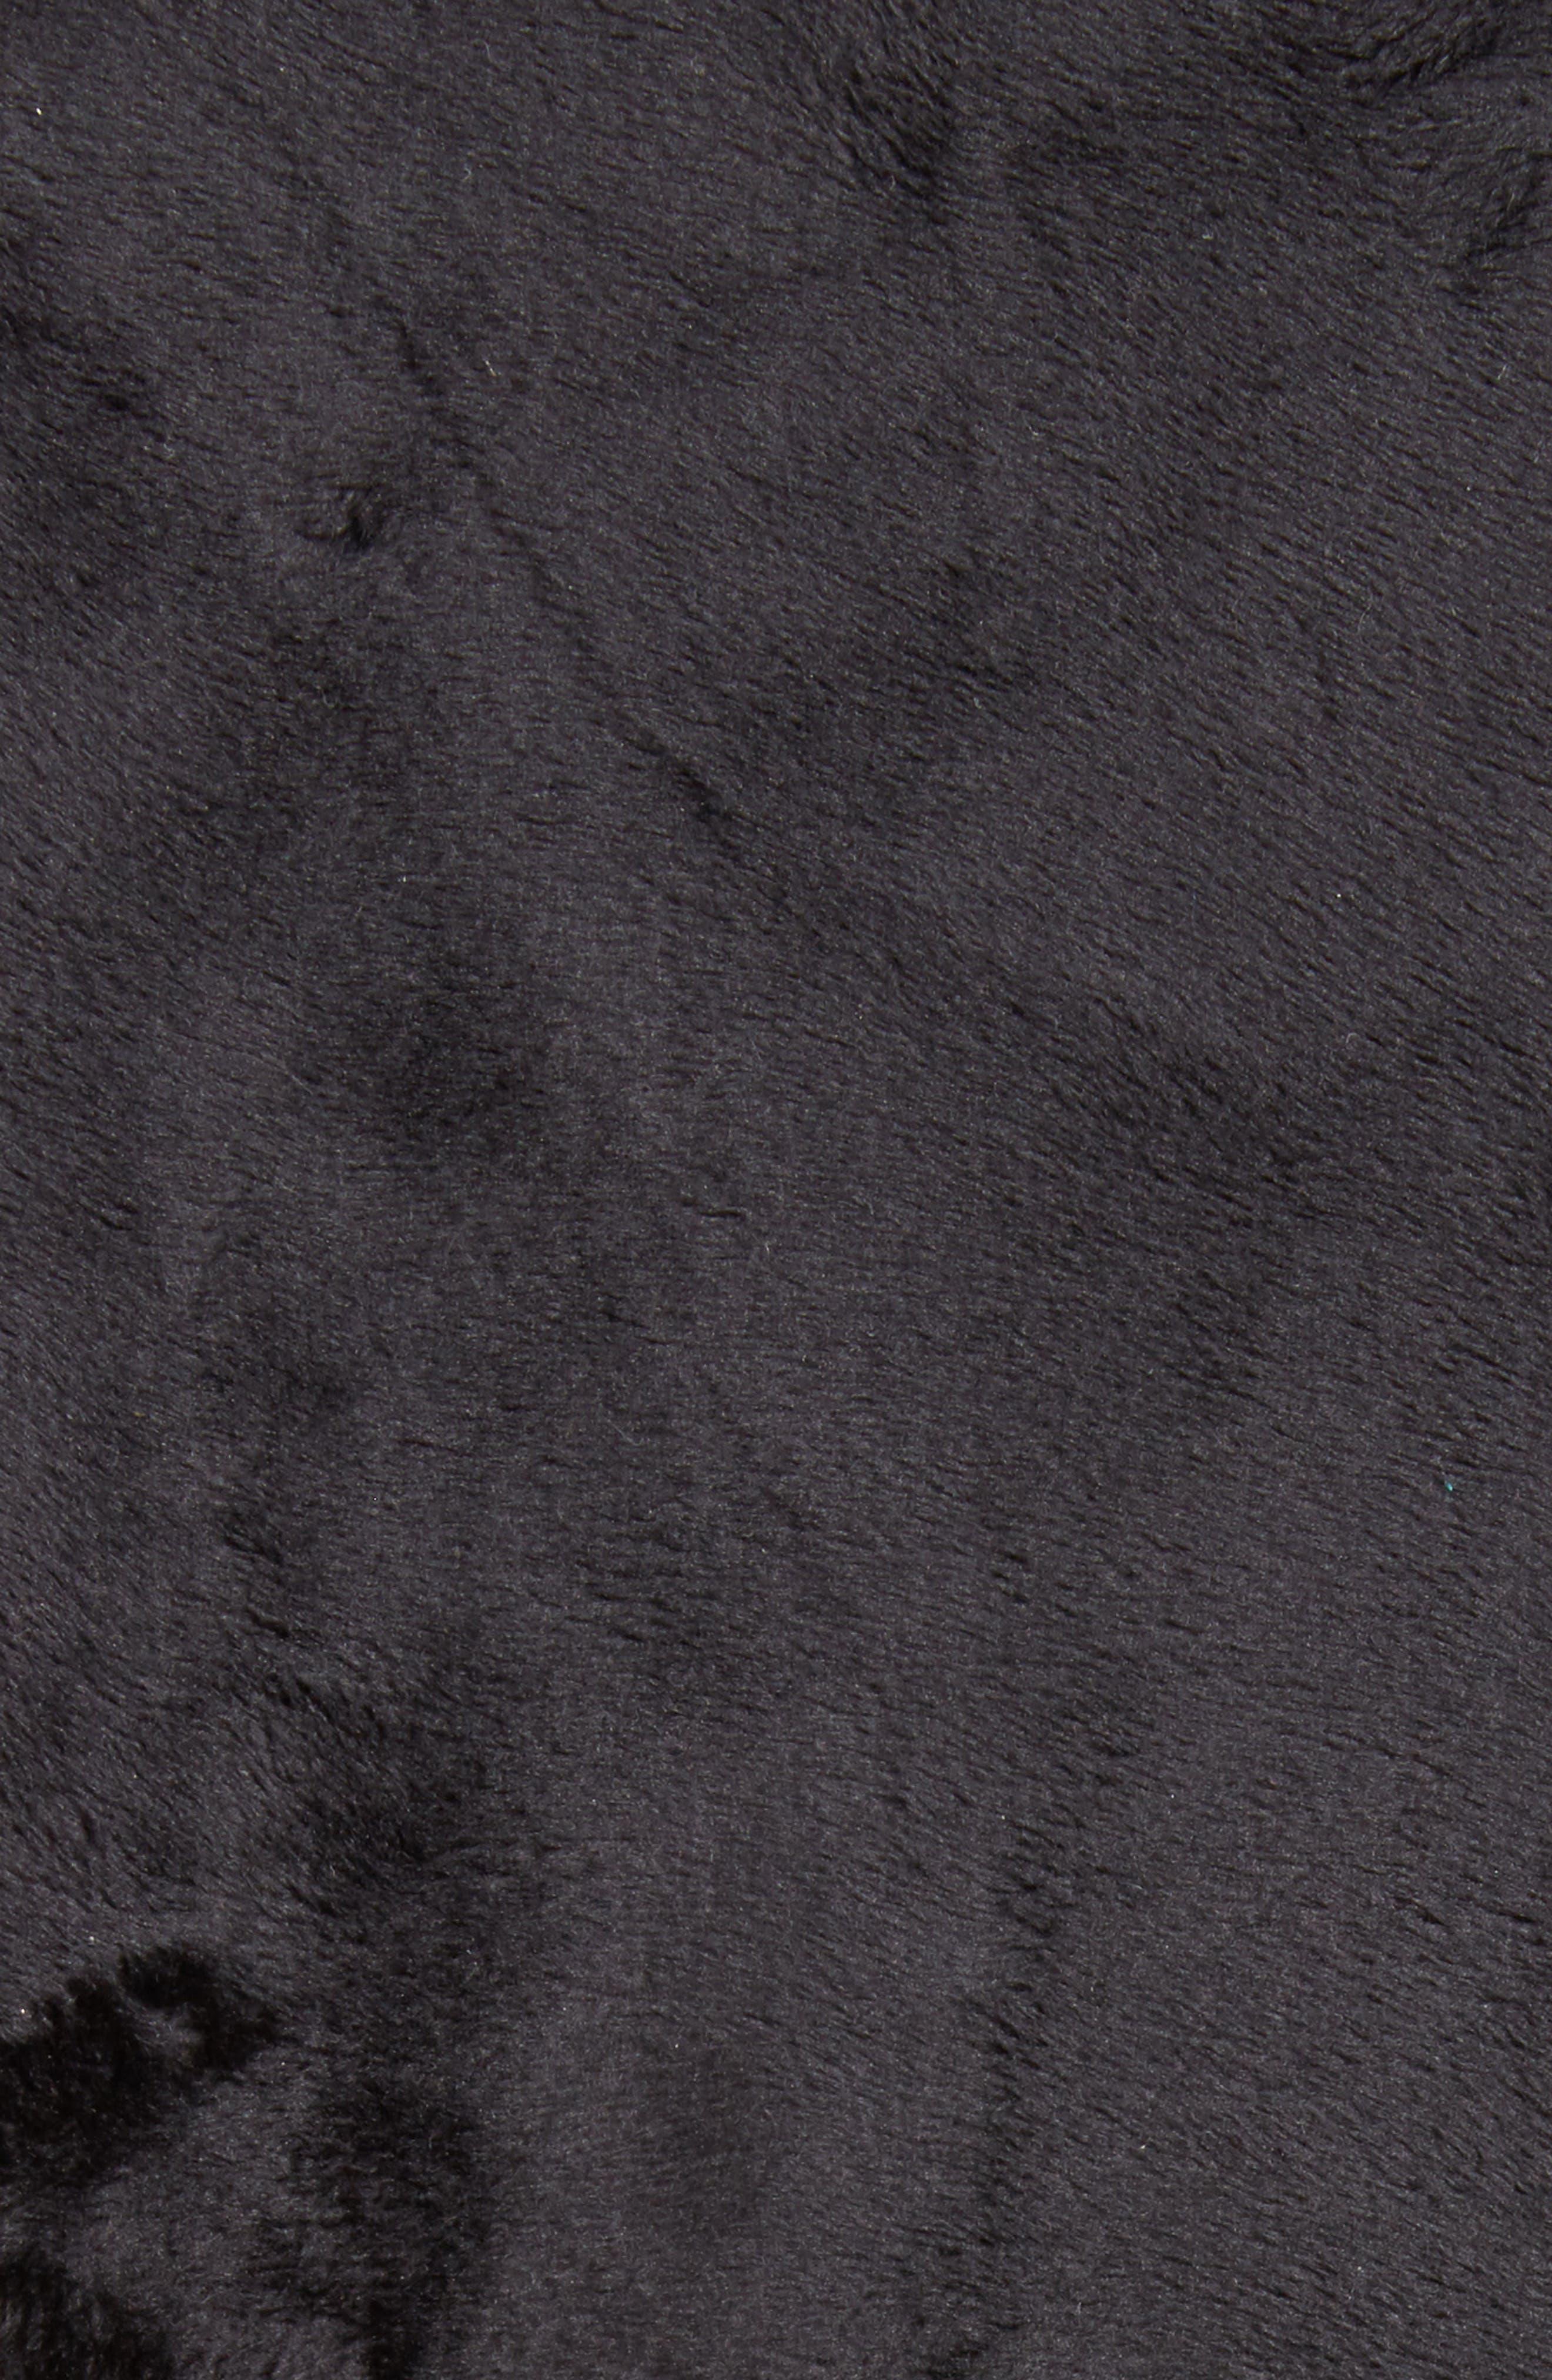 Solid Black Blankie,                             Alternate thumbnail 2, color,                             000